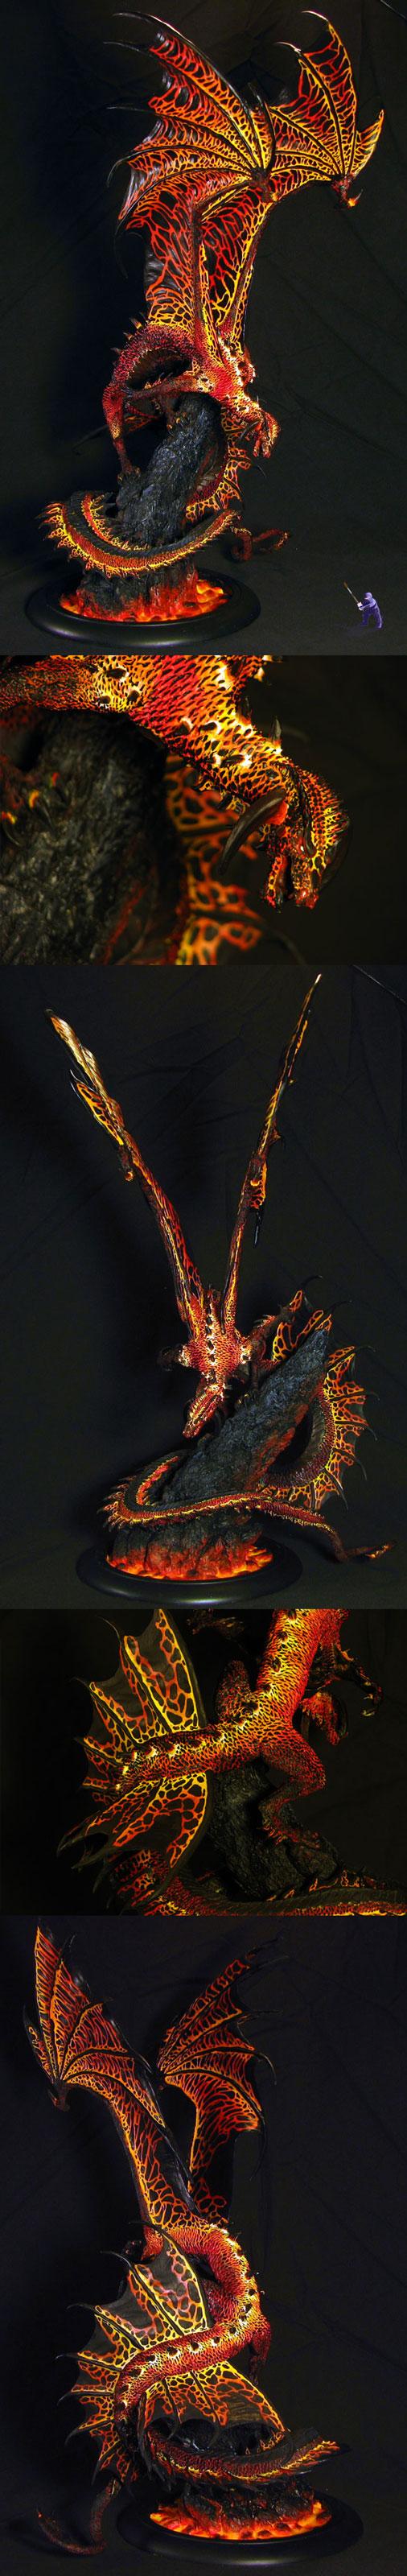 Viszeralyn the Oracle Dragon as Charsaug